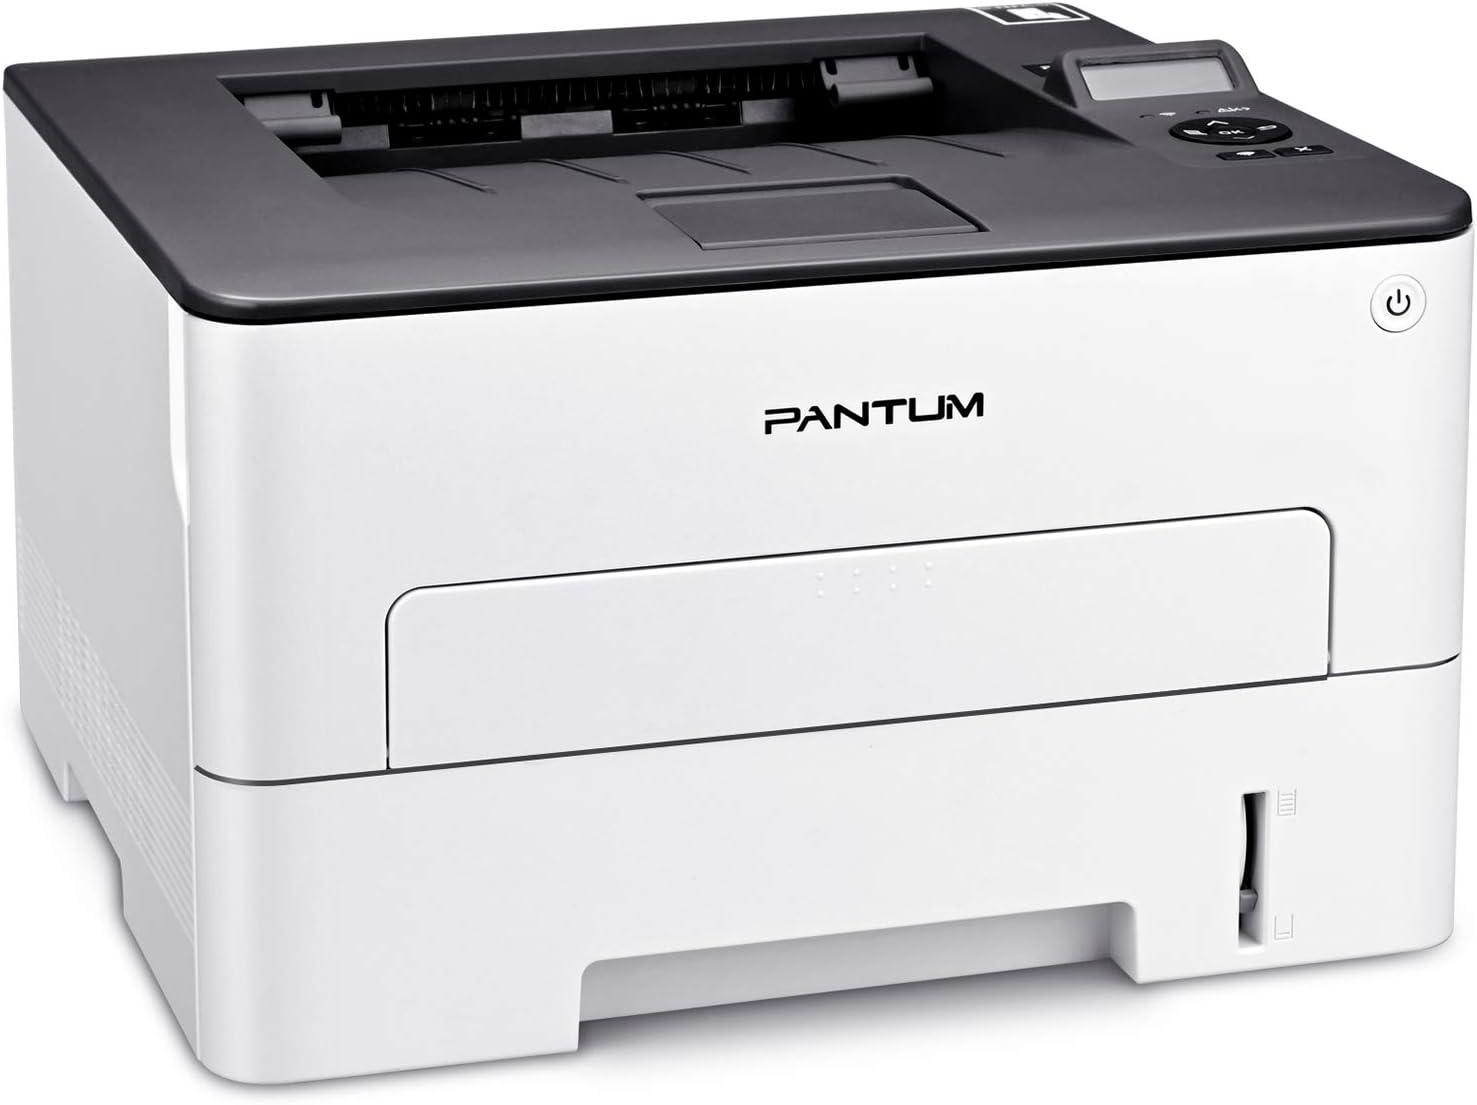 Pantum P3012DW Compact Monochrome Laser Printer Wireless Printing & Auto Two-Sided Printing